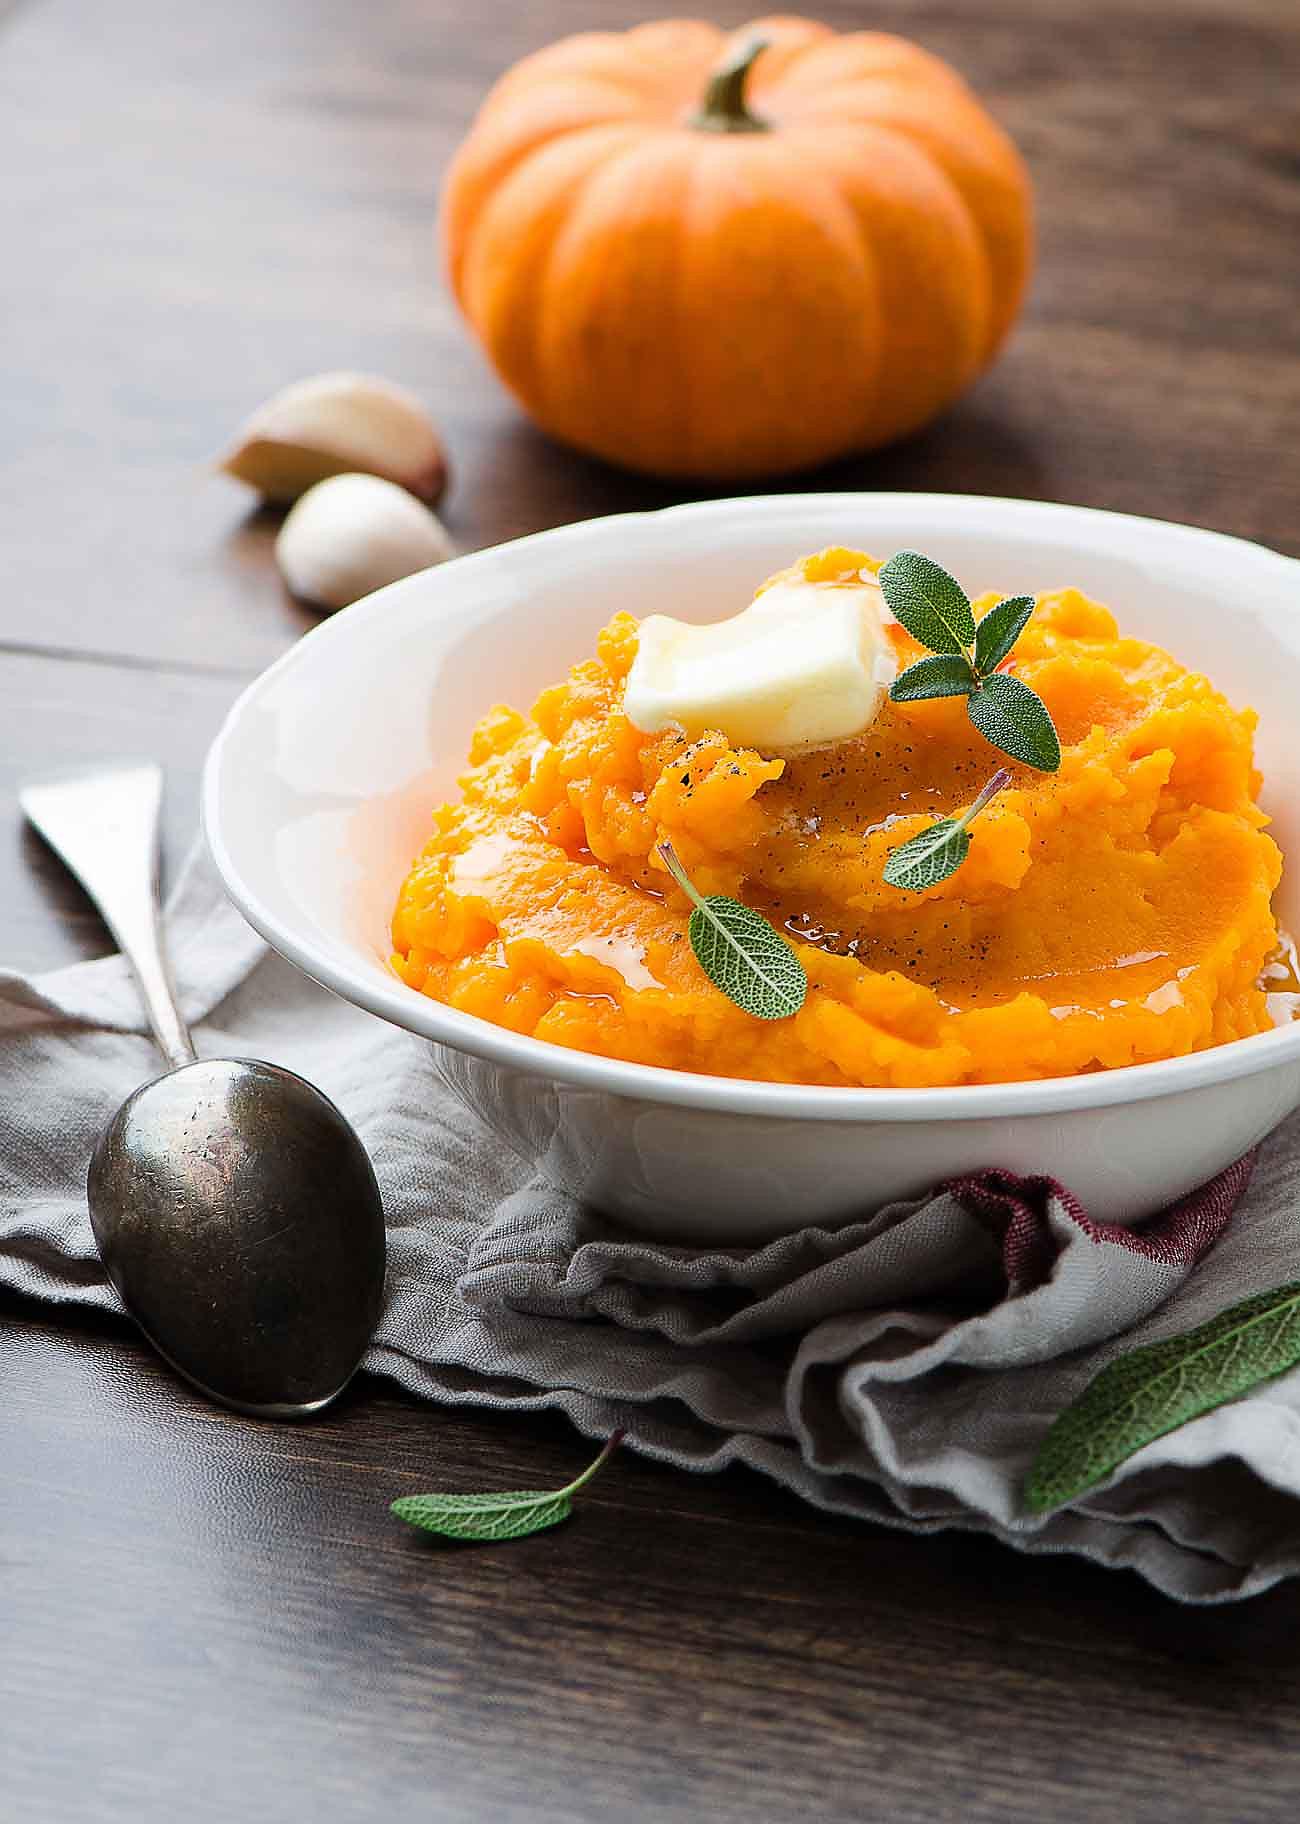 Pumpkin Puree Recipes Healthy  Homemade Pumpkin Puree Recipe by Archana s Kitchen